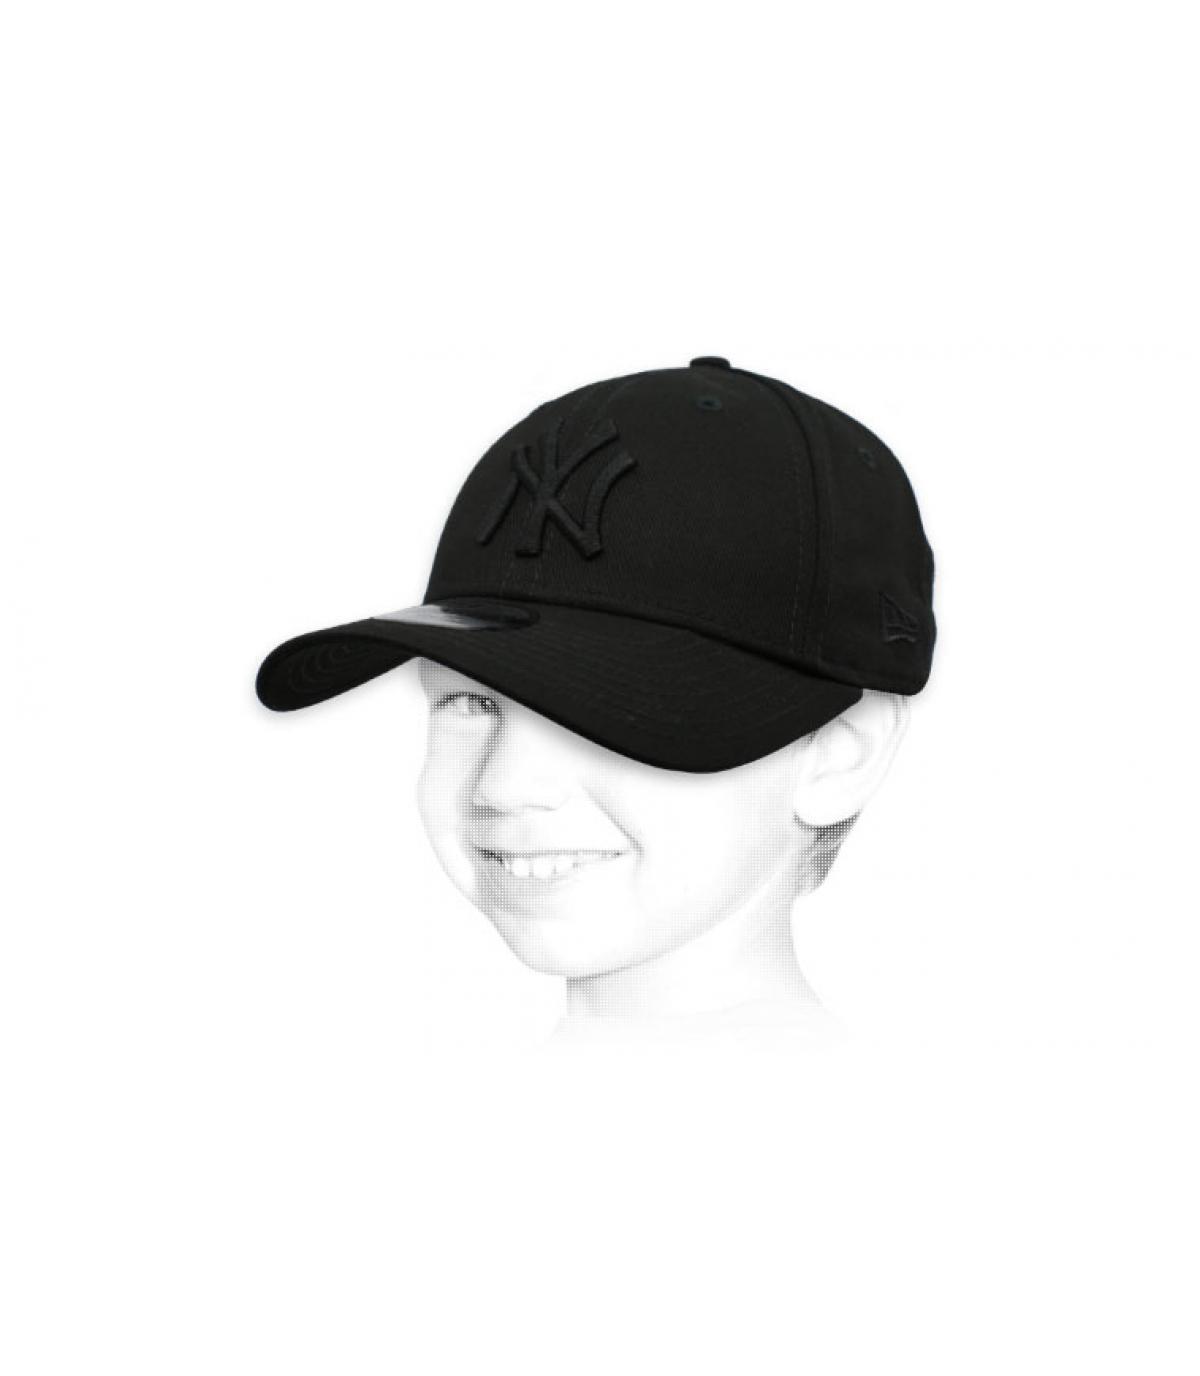 gorra infantil NY negro